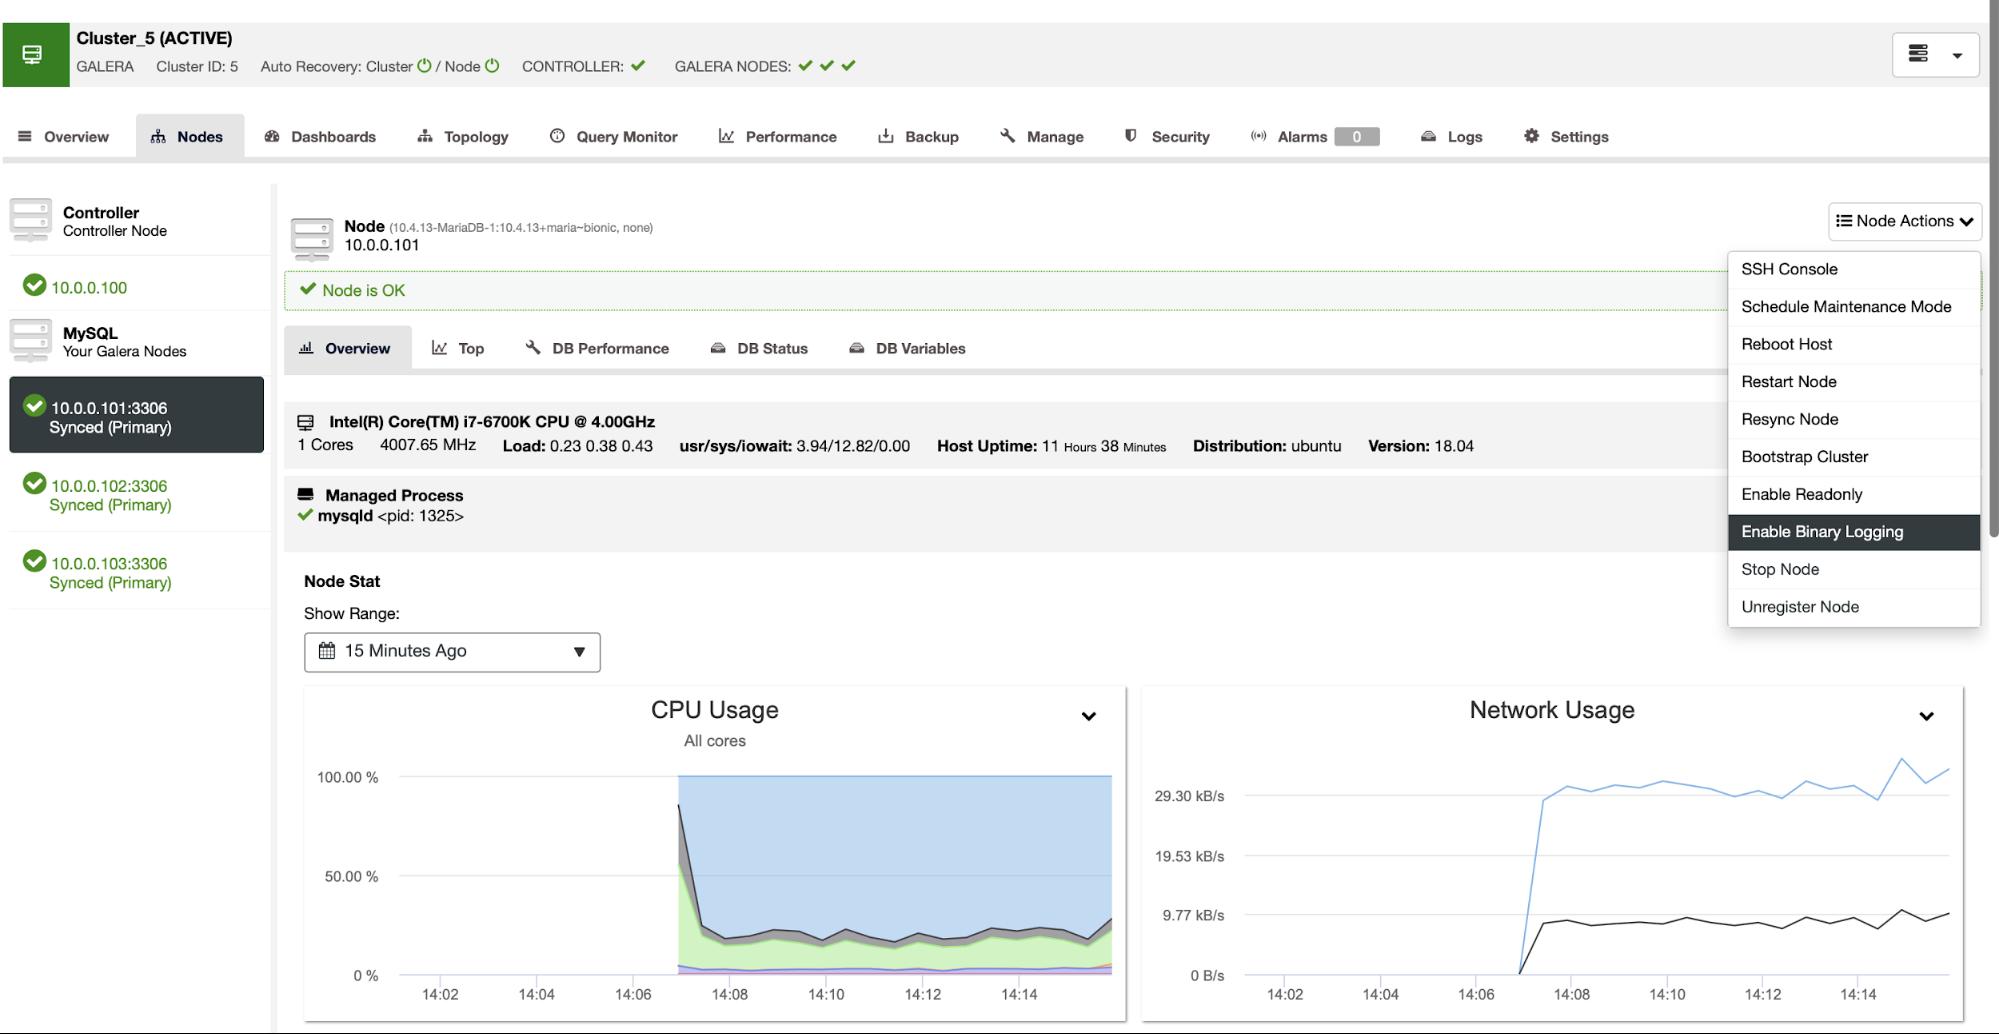 Deploying MariaDB Clusters Using Asynchronous Replication